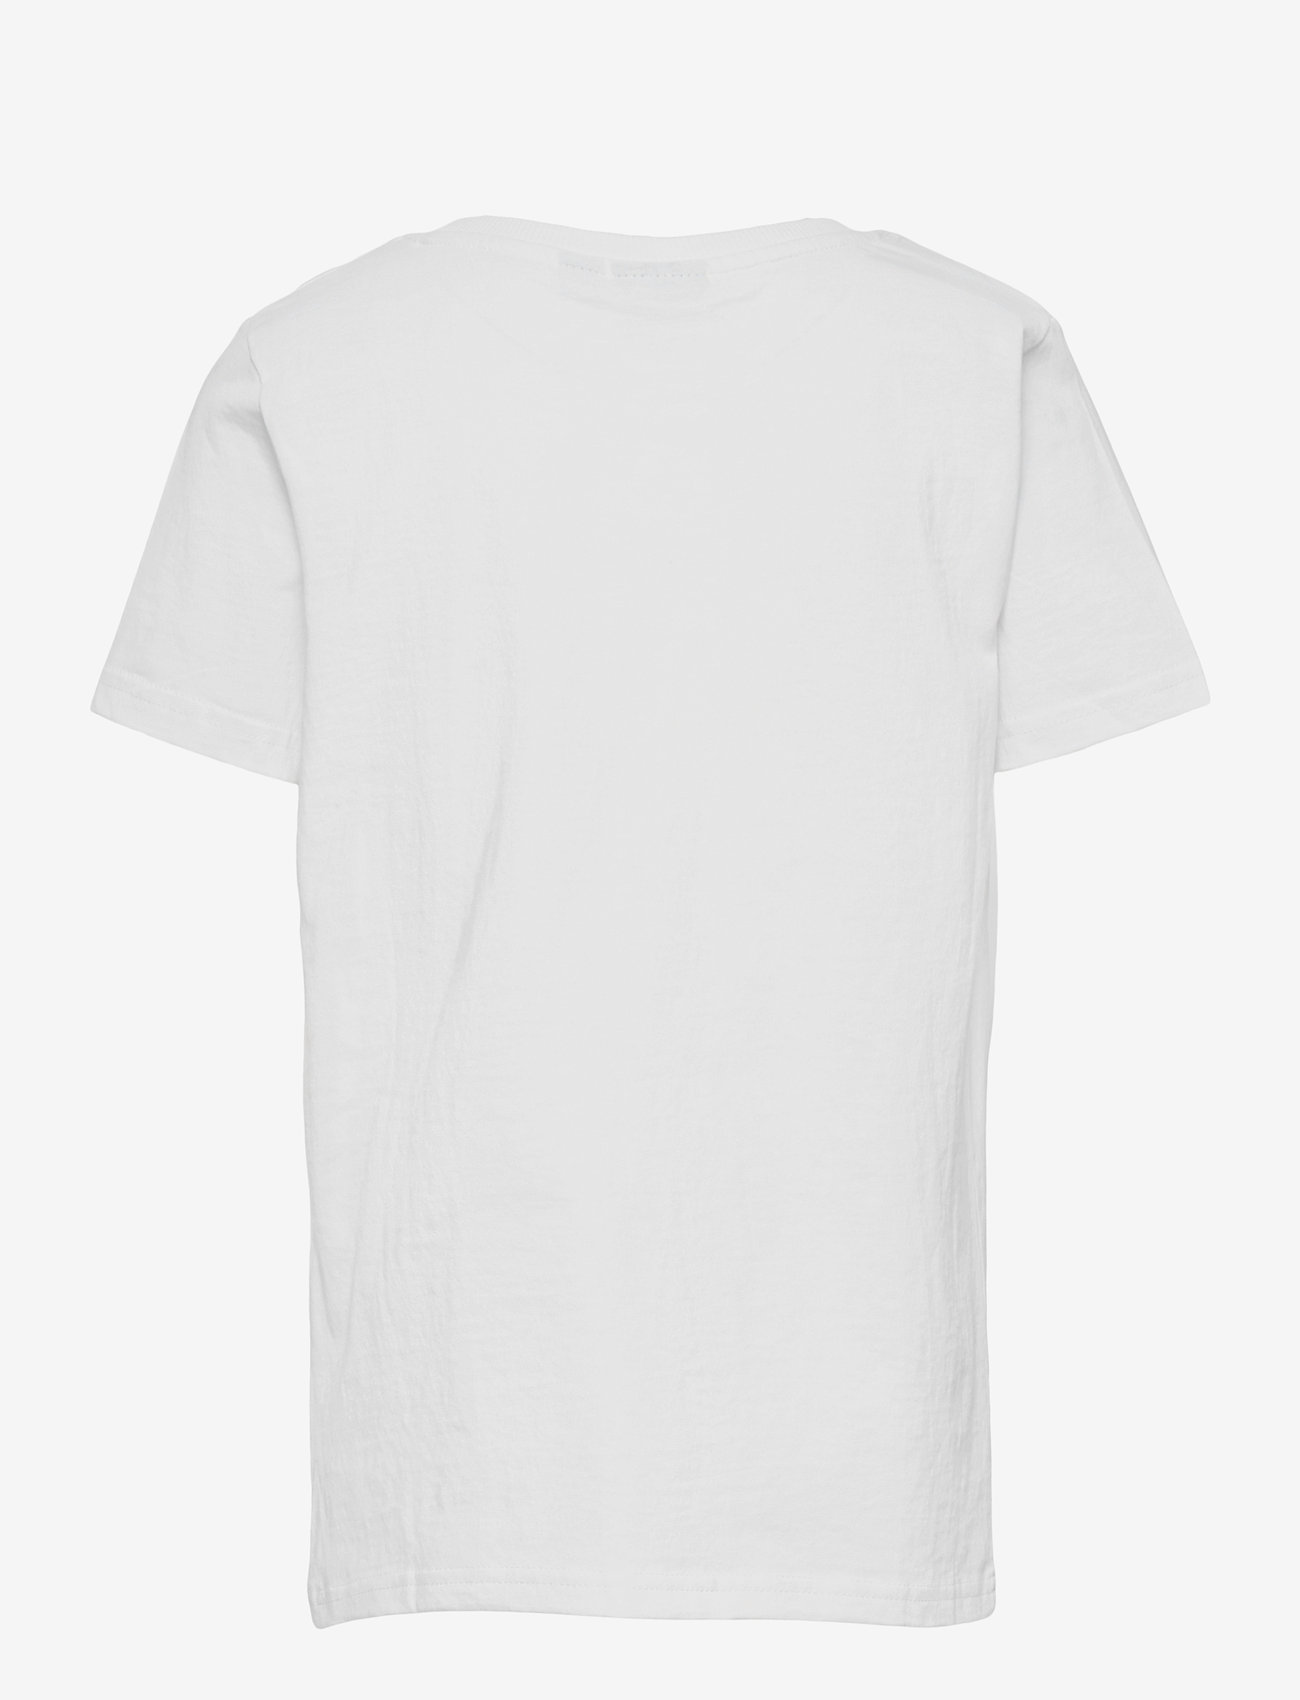 LMTD - NLMRICHARD SS R TOP - t-shirts - bright white - 1